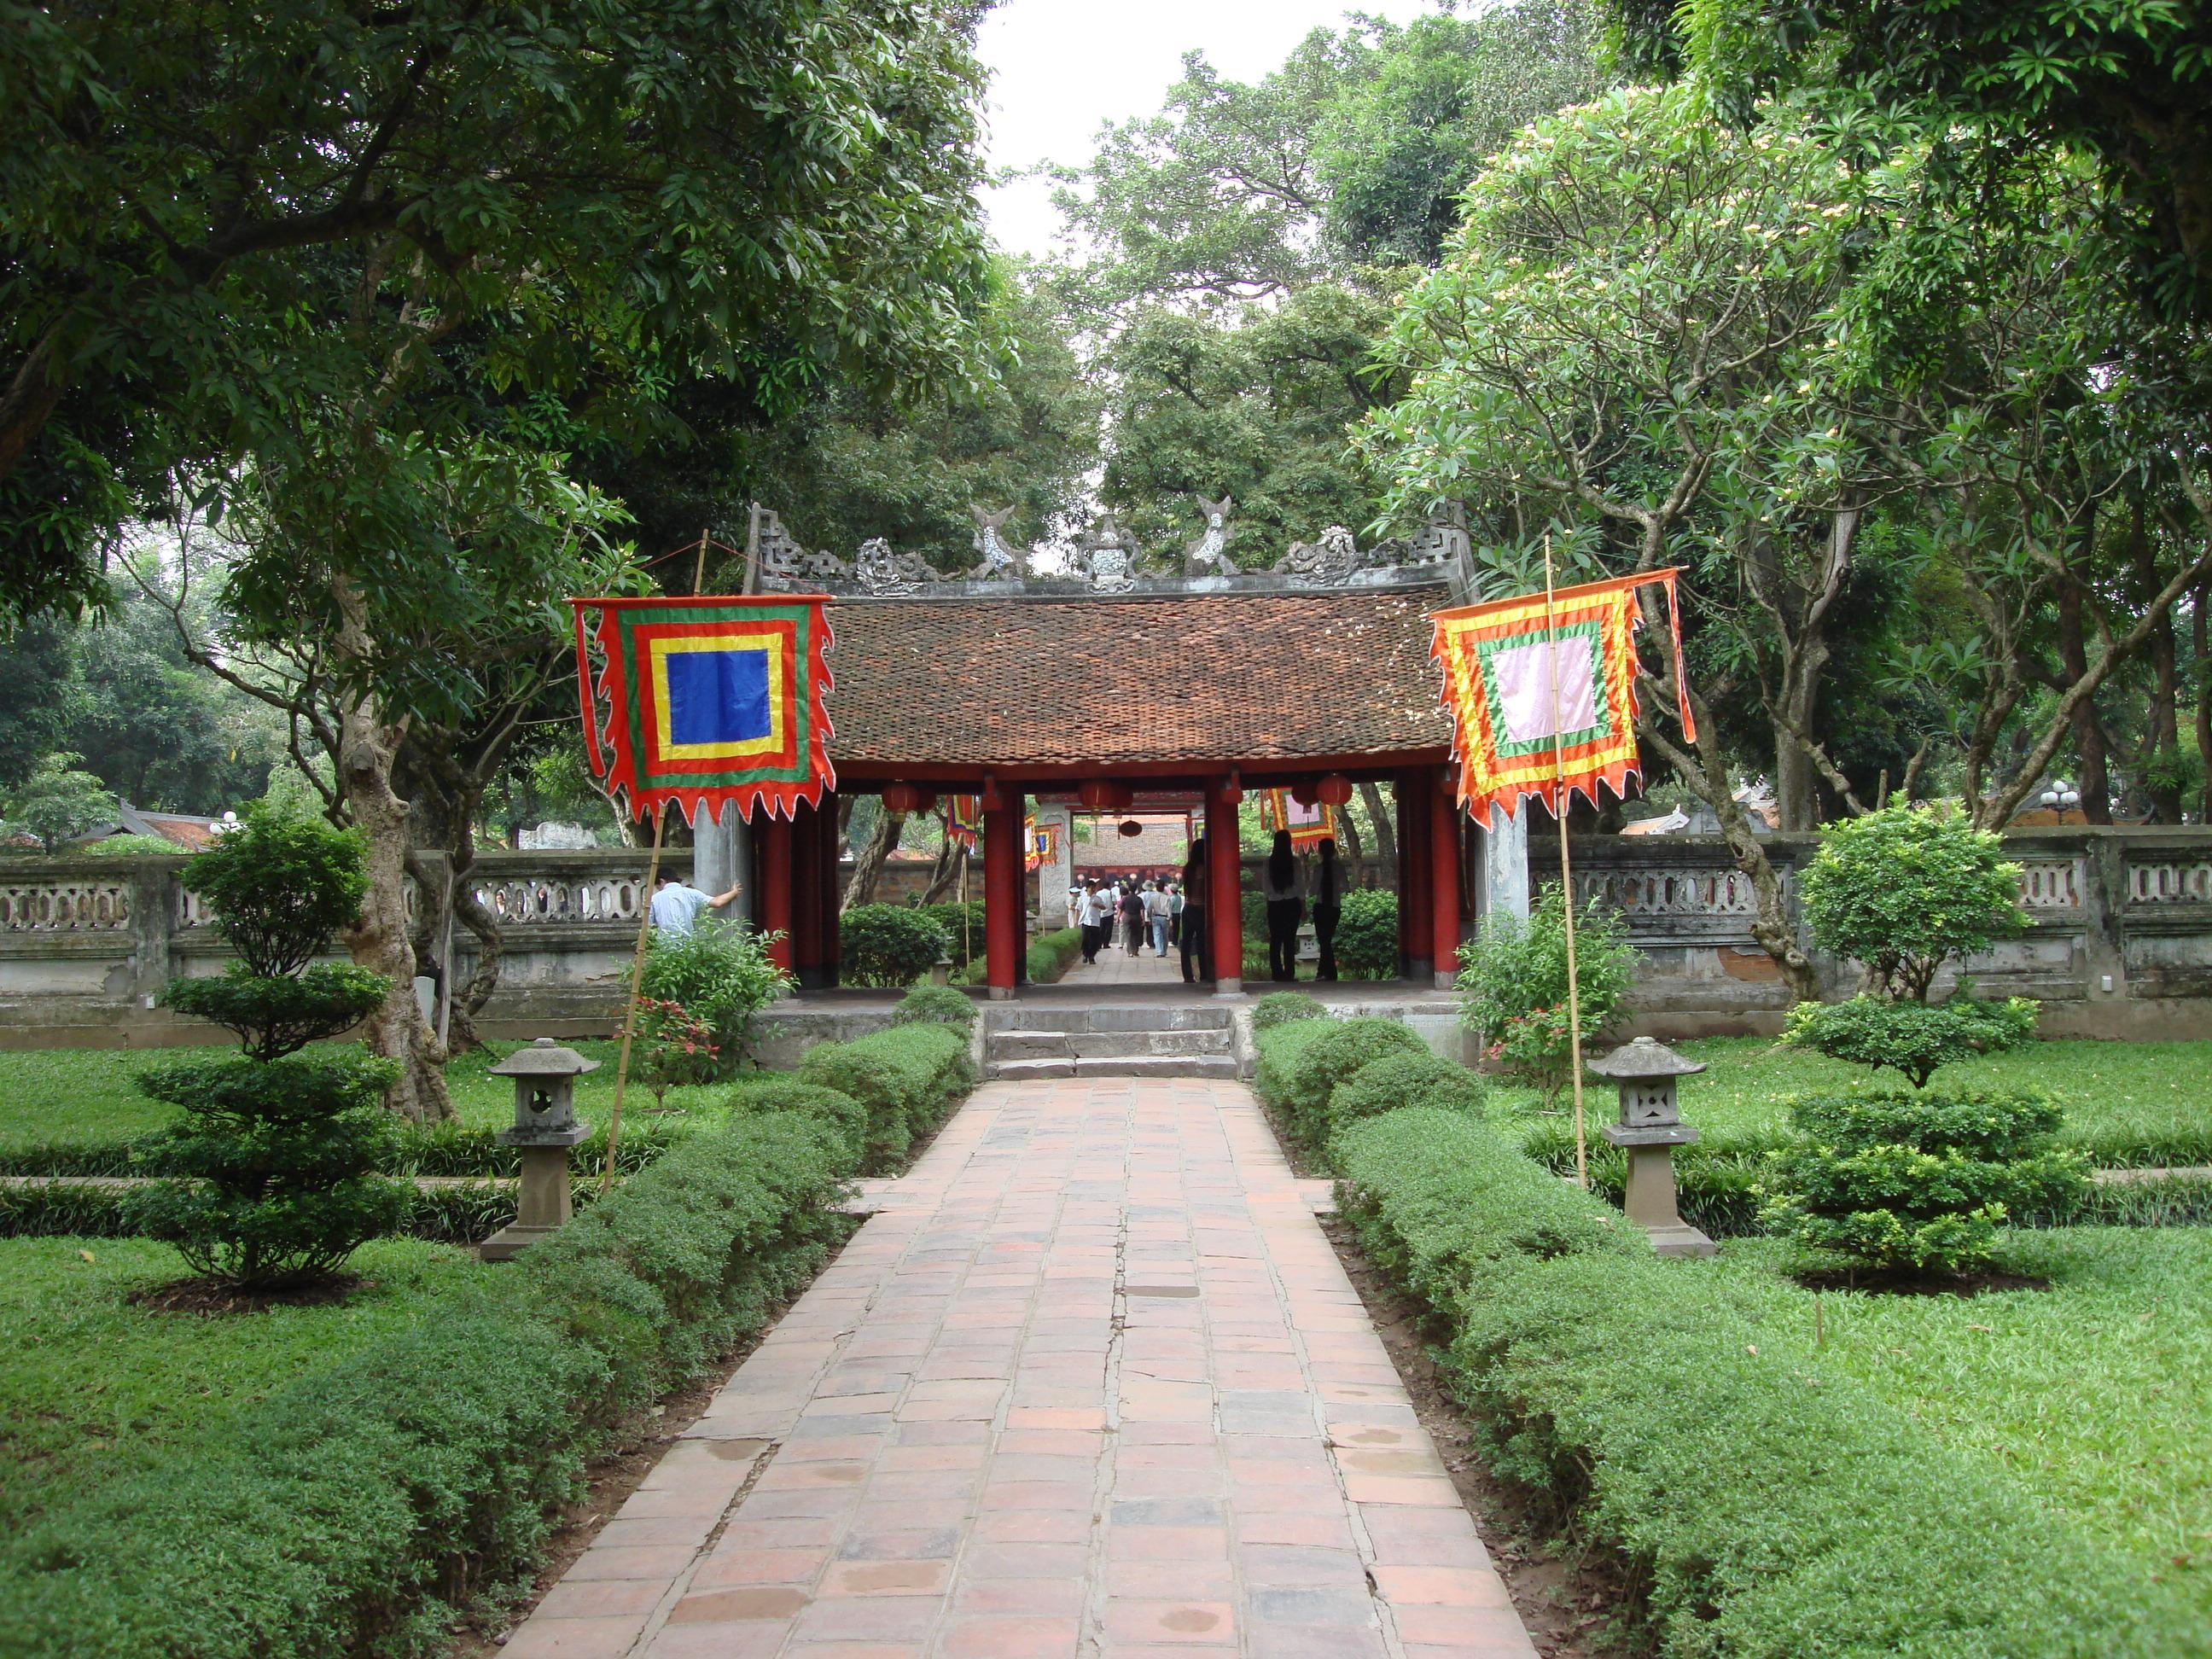 FileVan Mieu Hanoi 4550352543 7f085eeb24 T